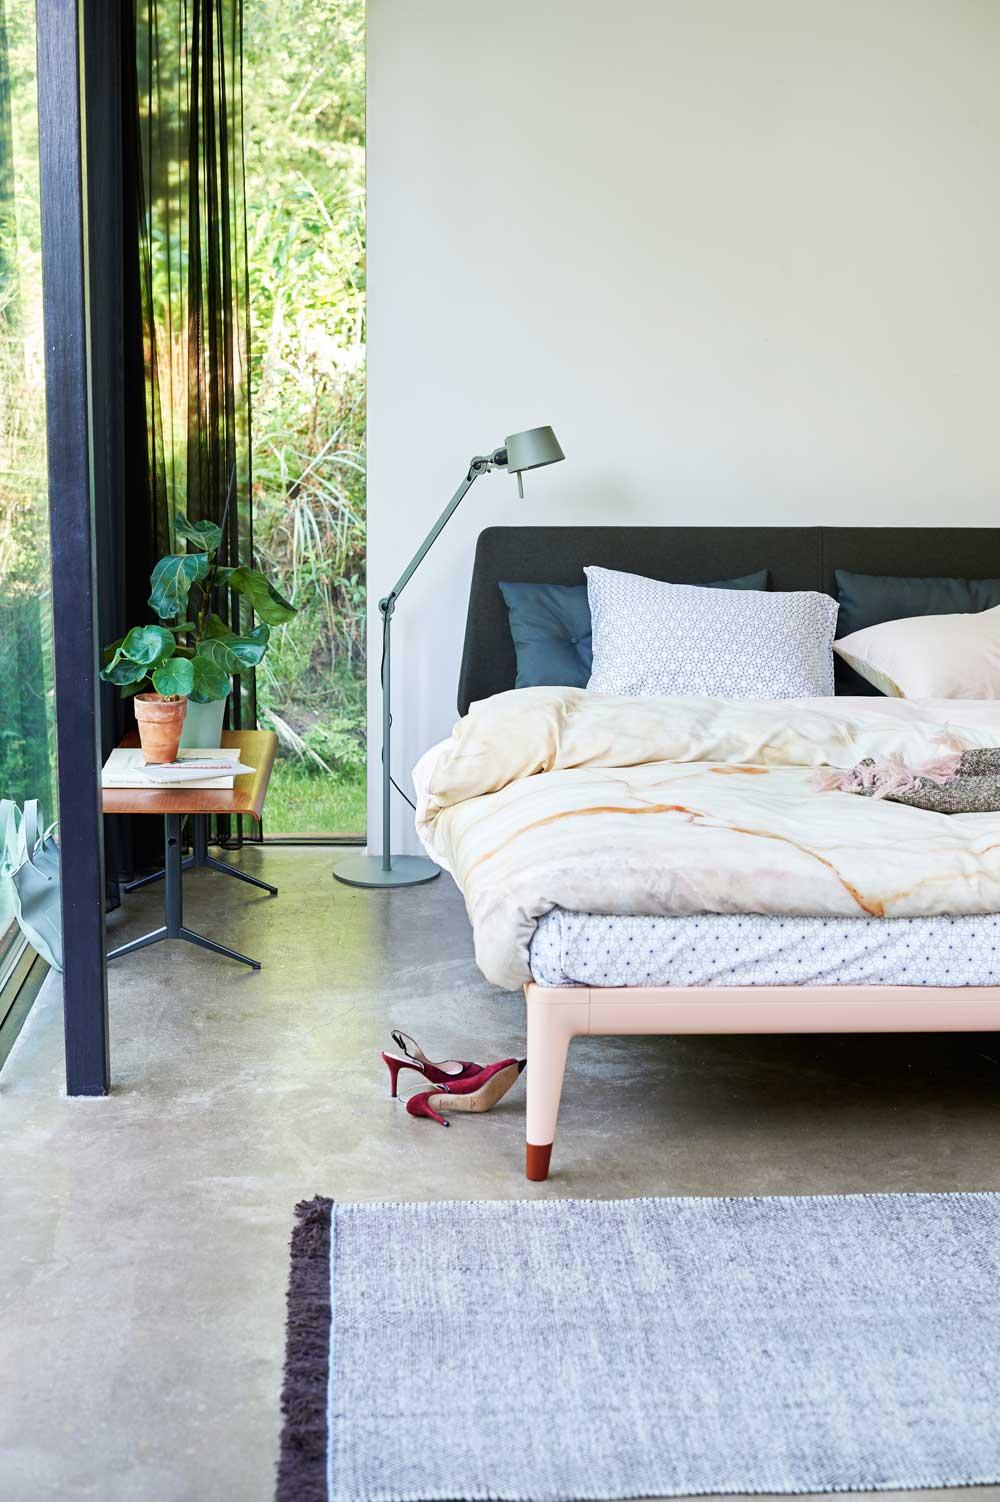 auping plaza k ln betten boxspringbetten und mehr. Black Bedroom Furniture Sets. Home Design Ideas